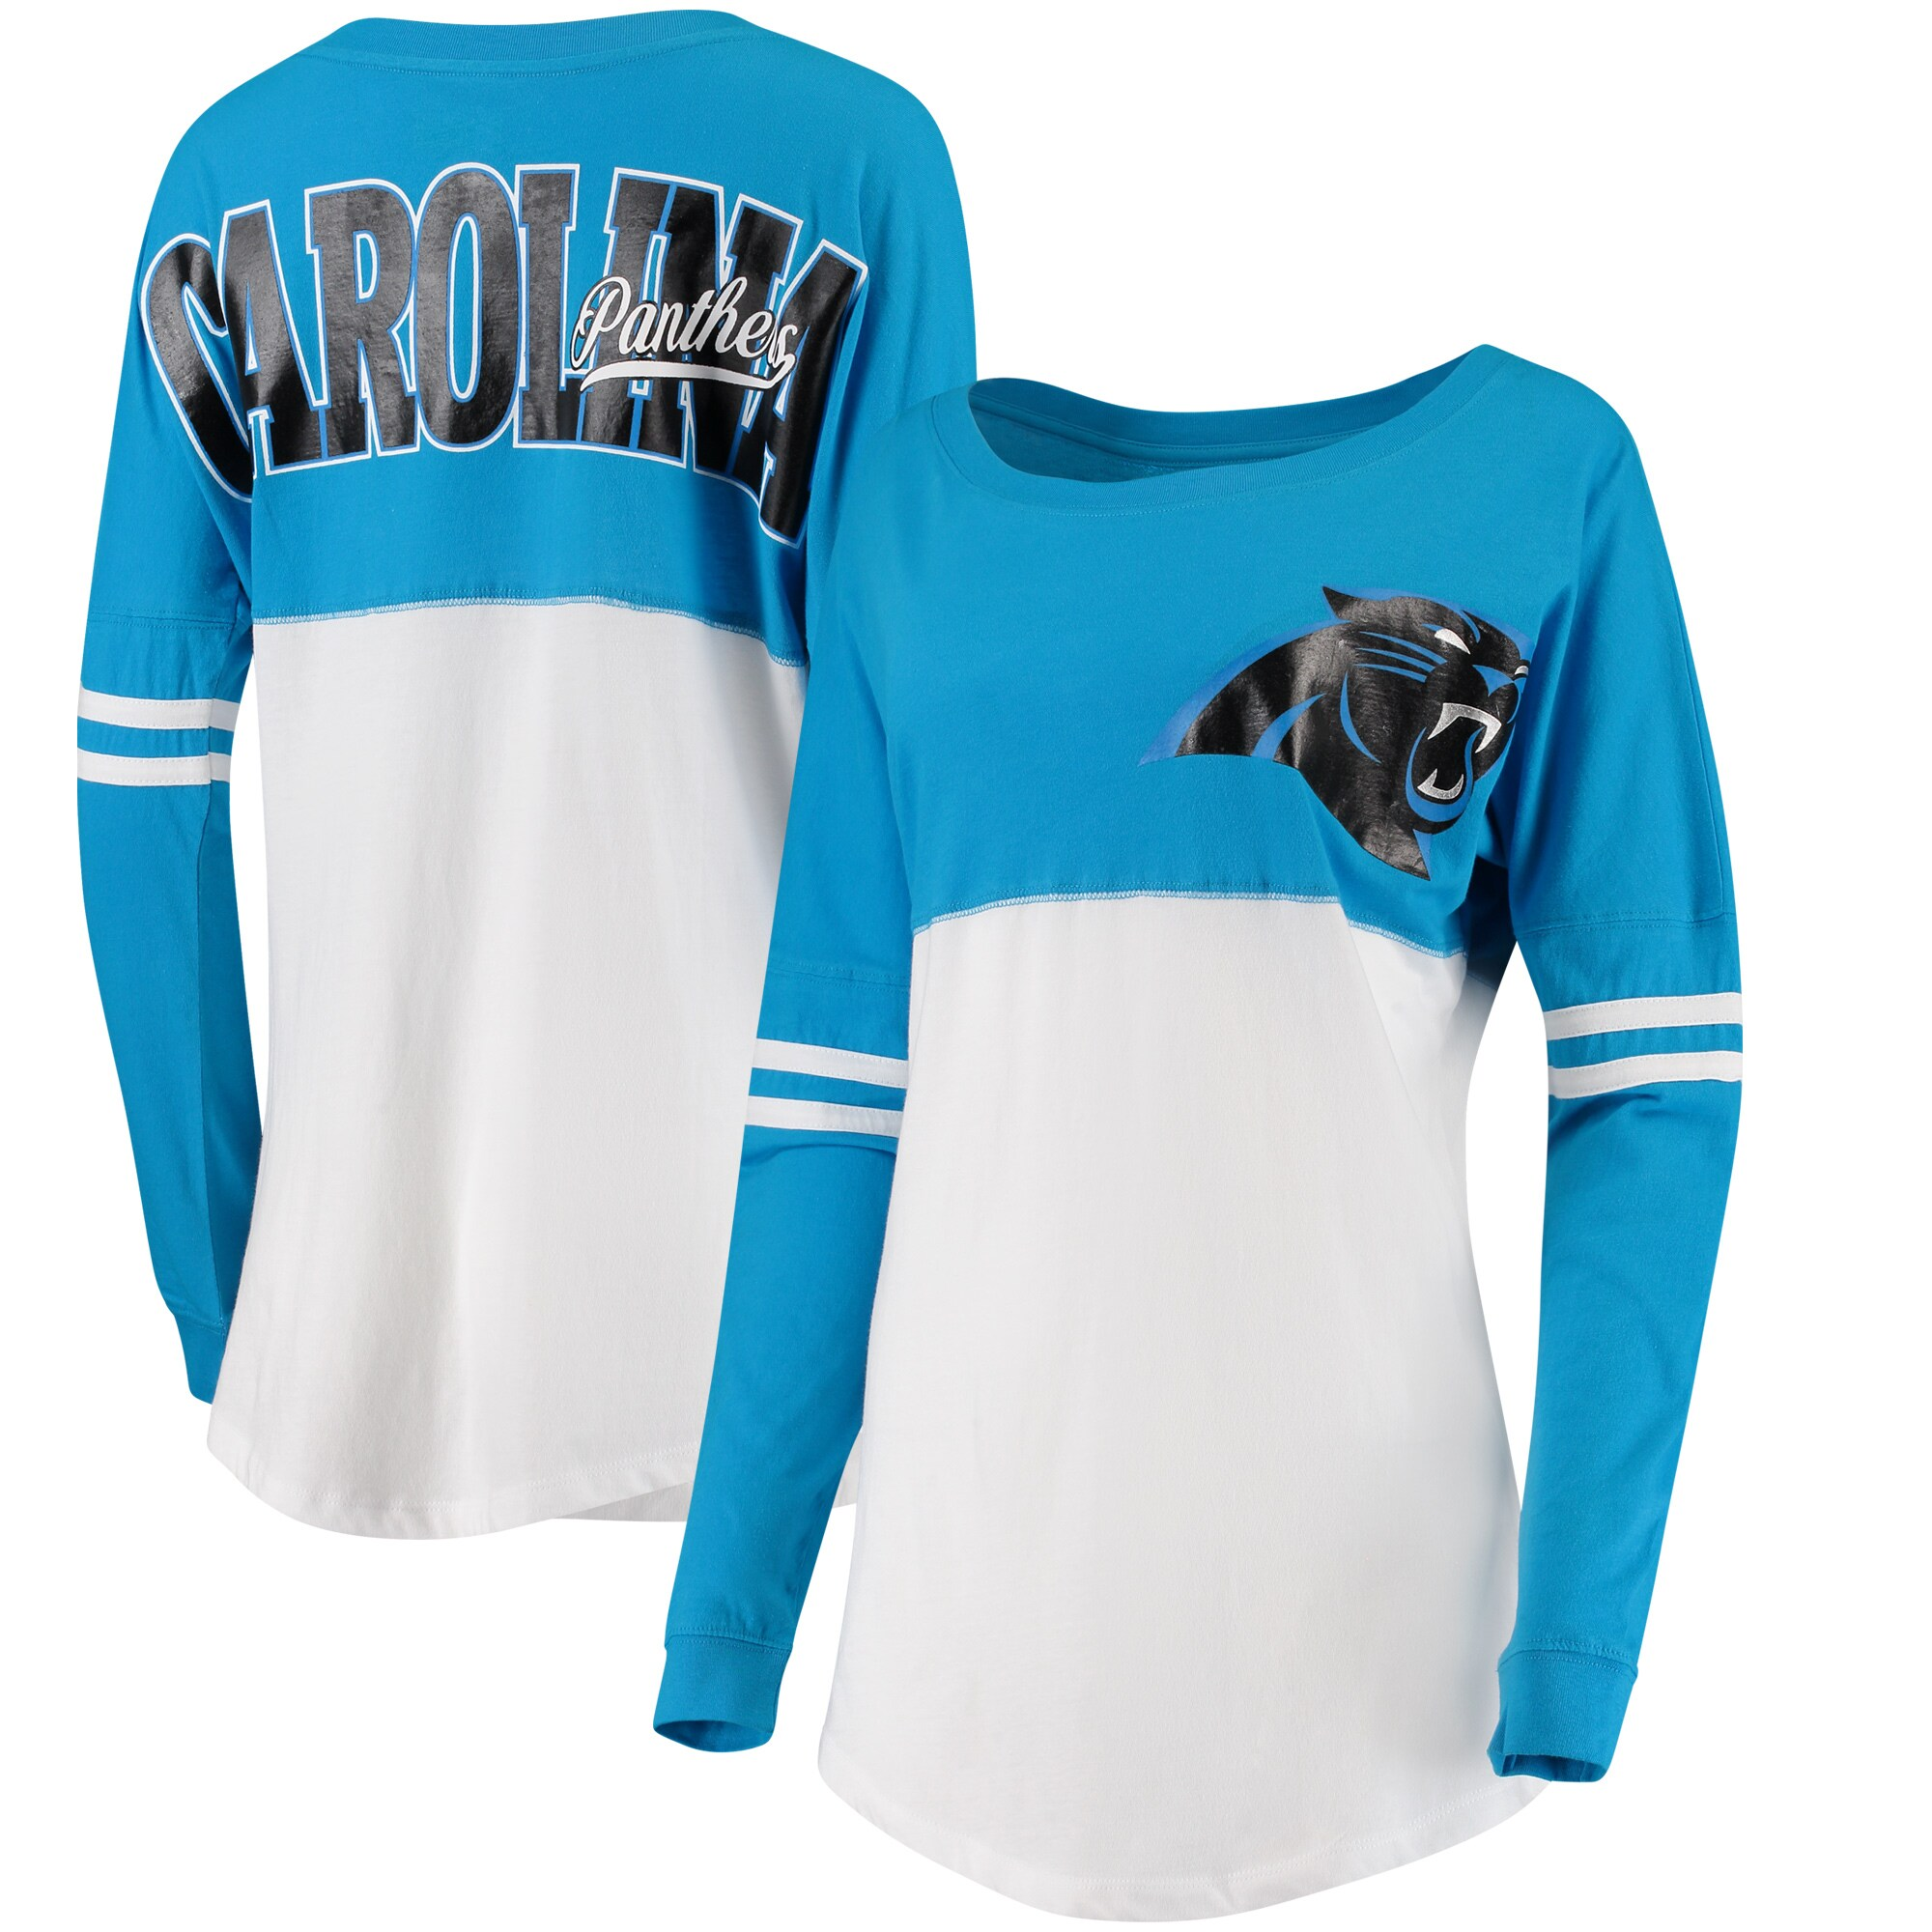 Carolina Panthers 5th & Ocean by New Era Women's Team Logo Athletic Varsity Long Sleeve T-Shirt - Blue/White